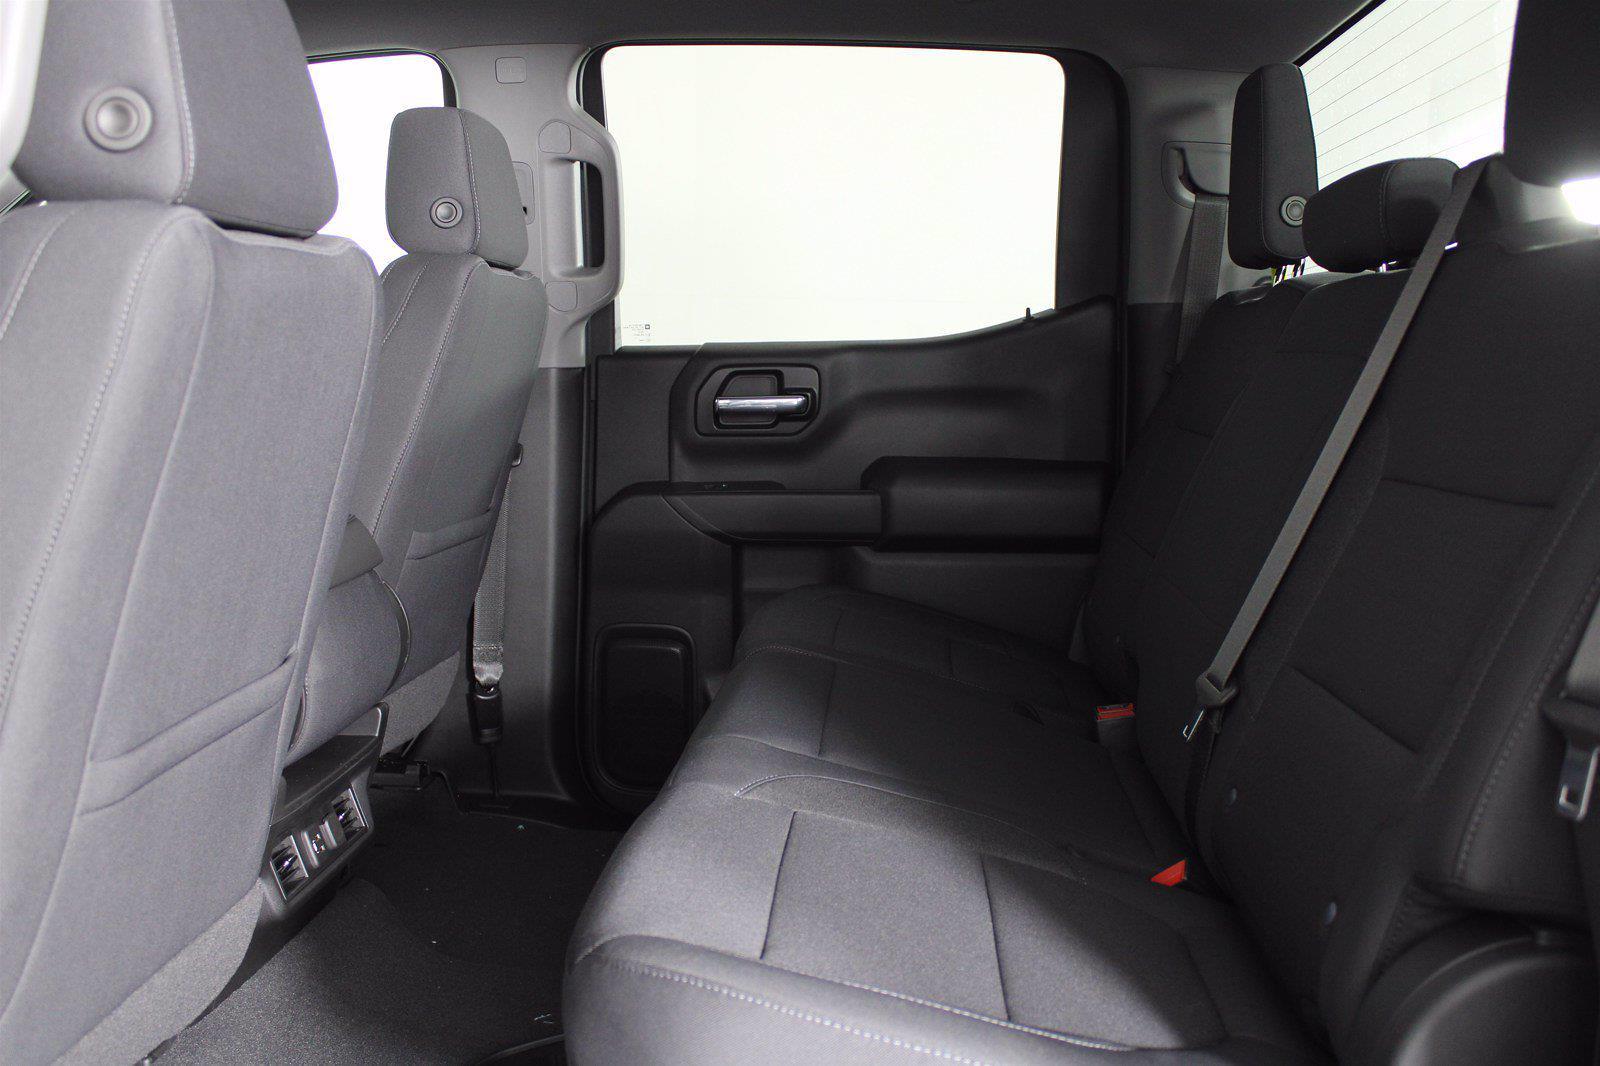 2021 Chevrolet Silverado 1500 Crew Cab 4x4, Pickup #D111143 - photo 16